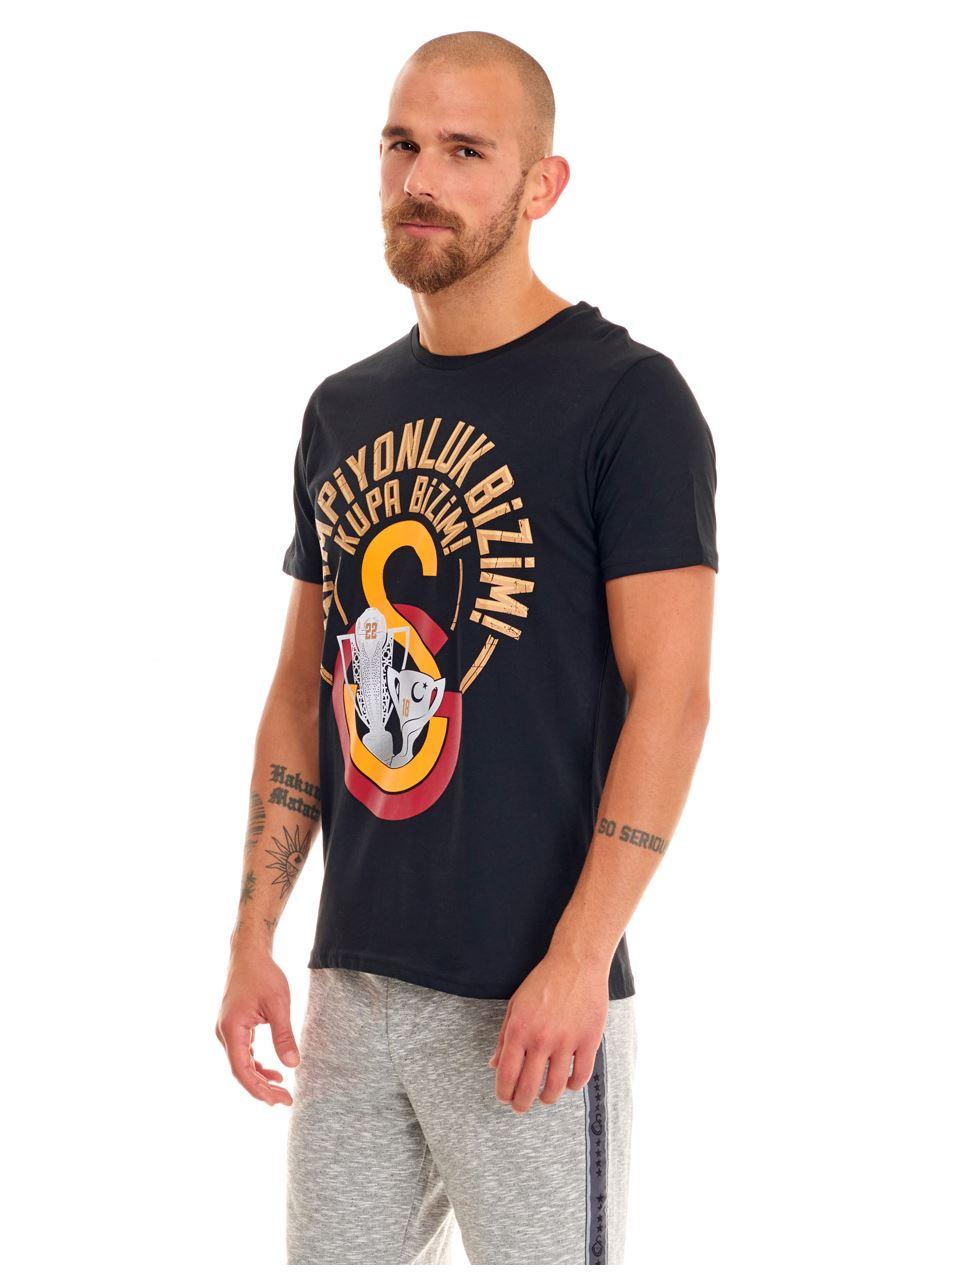 Galatasaray Şampiyonluk Bizim! Kupa Bizim! Erkek T-shirt E191278